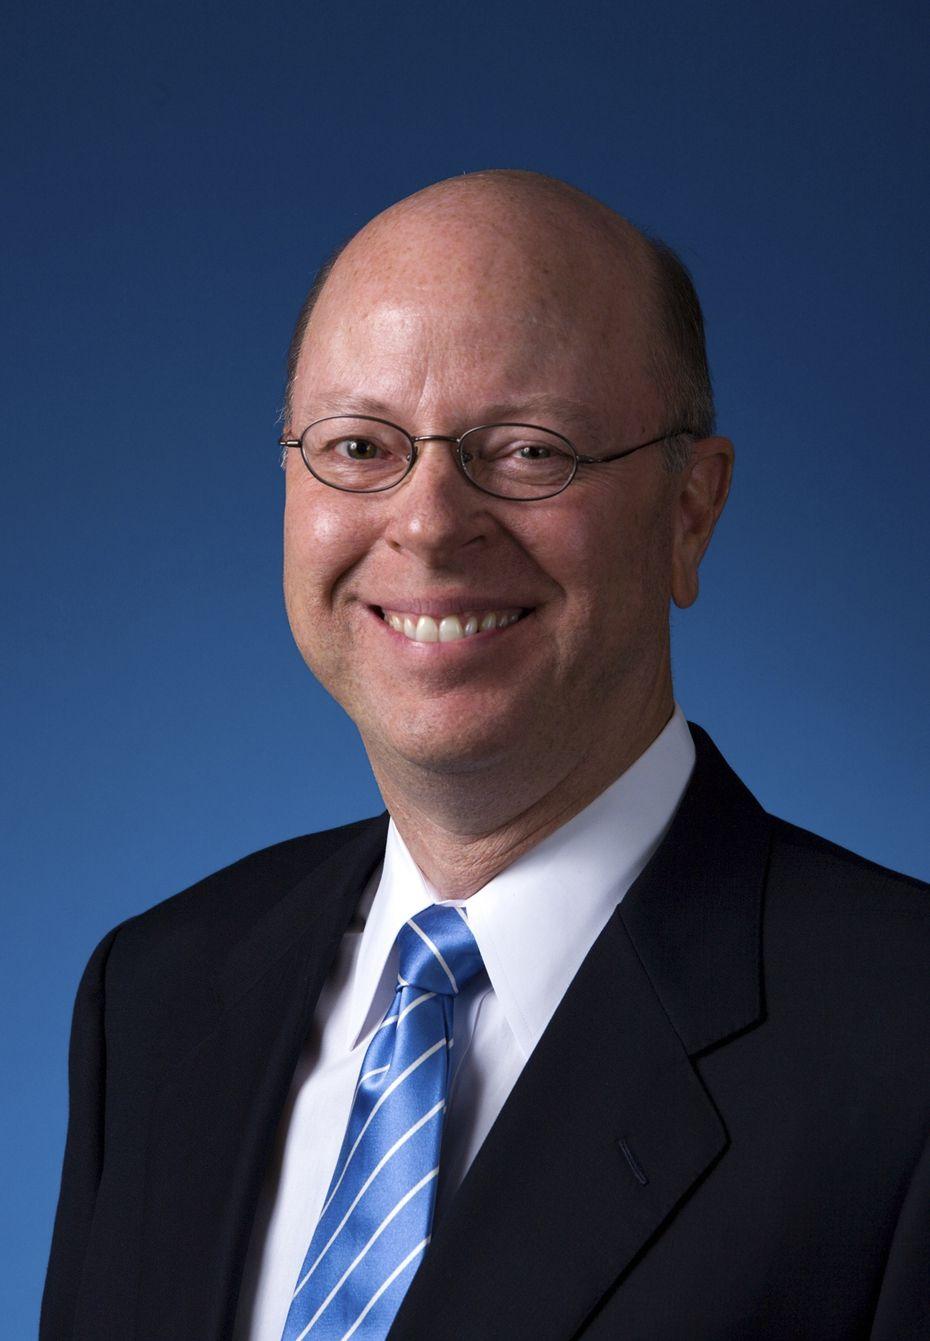 Keith Cargill